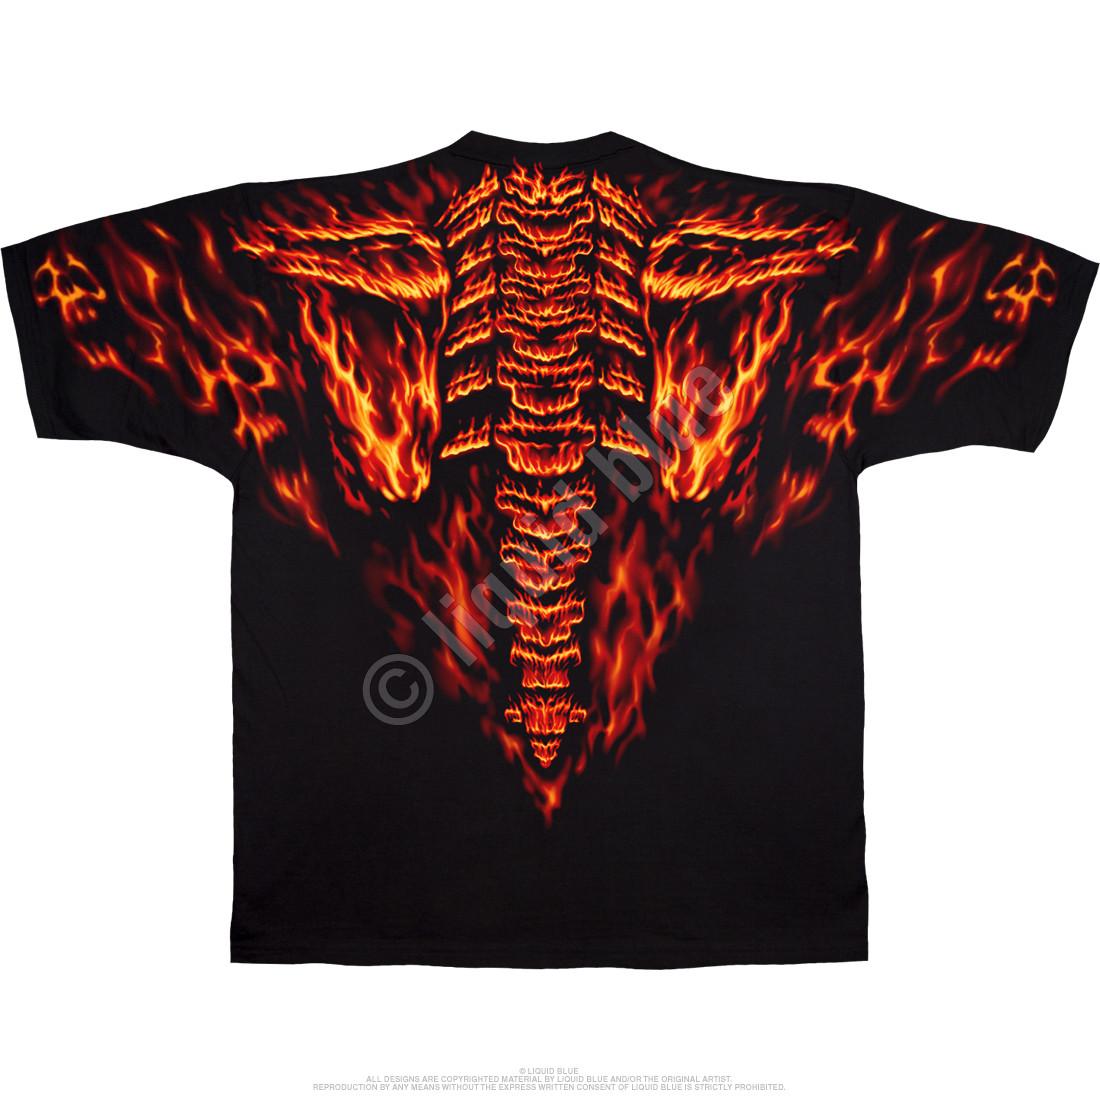 Raging Inferno Black T-Shirt